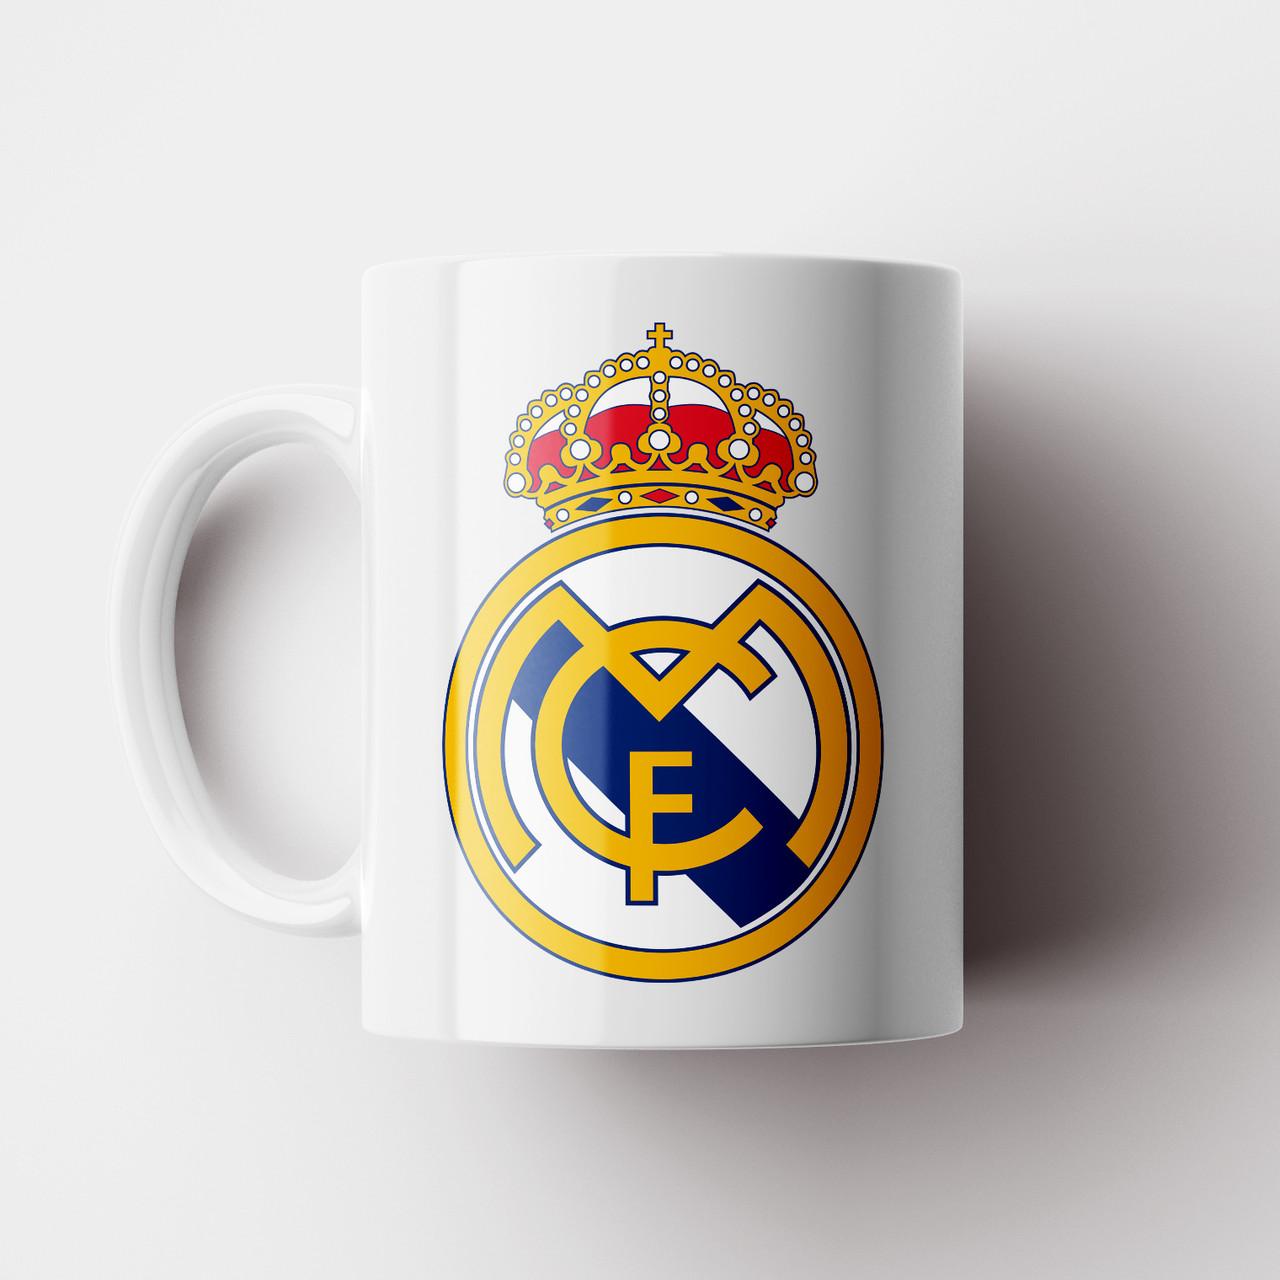 Чашка ФК Реал Мадрид. Real Madrid CF. Футбол. Чашка з фото